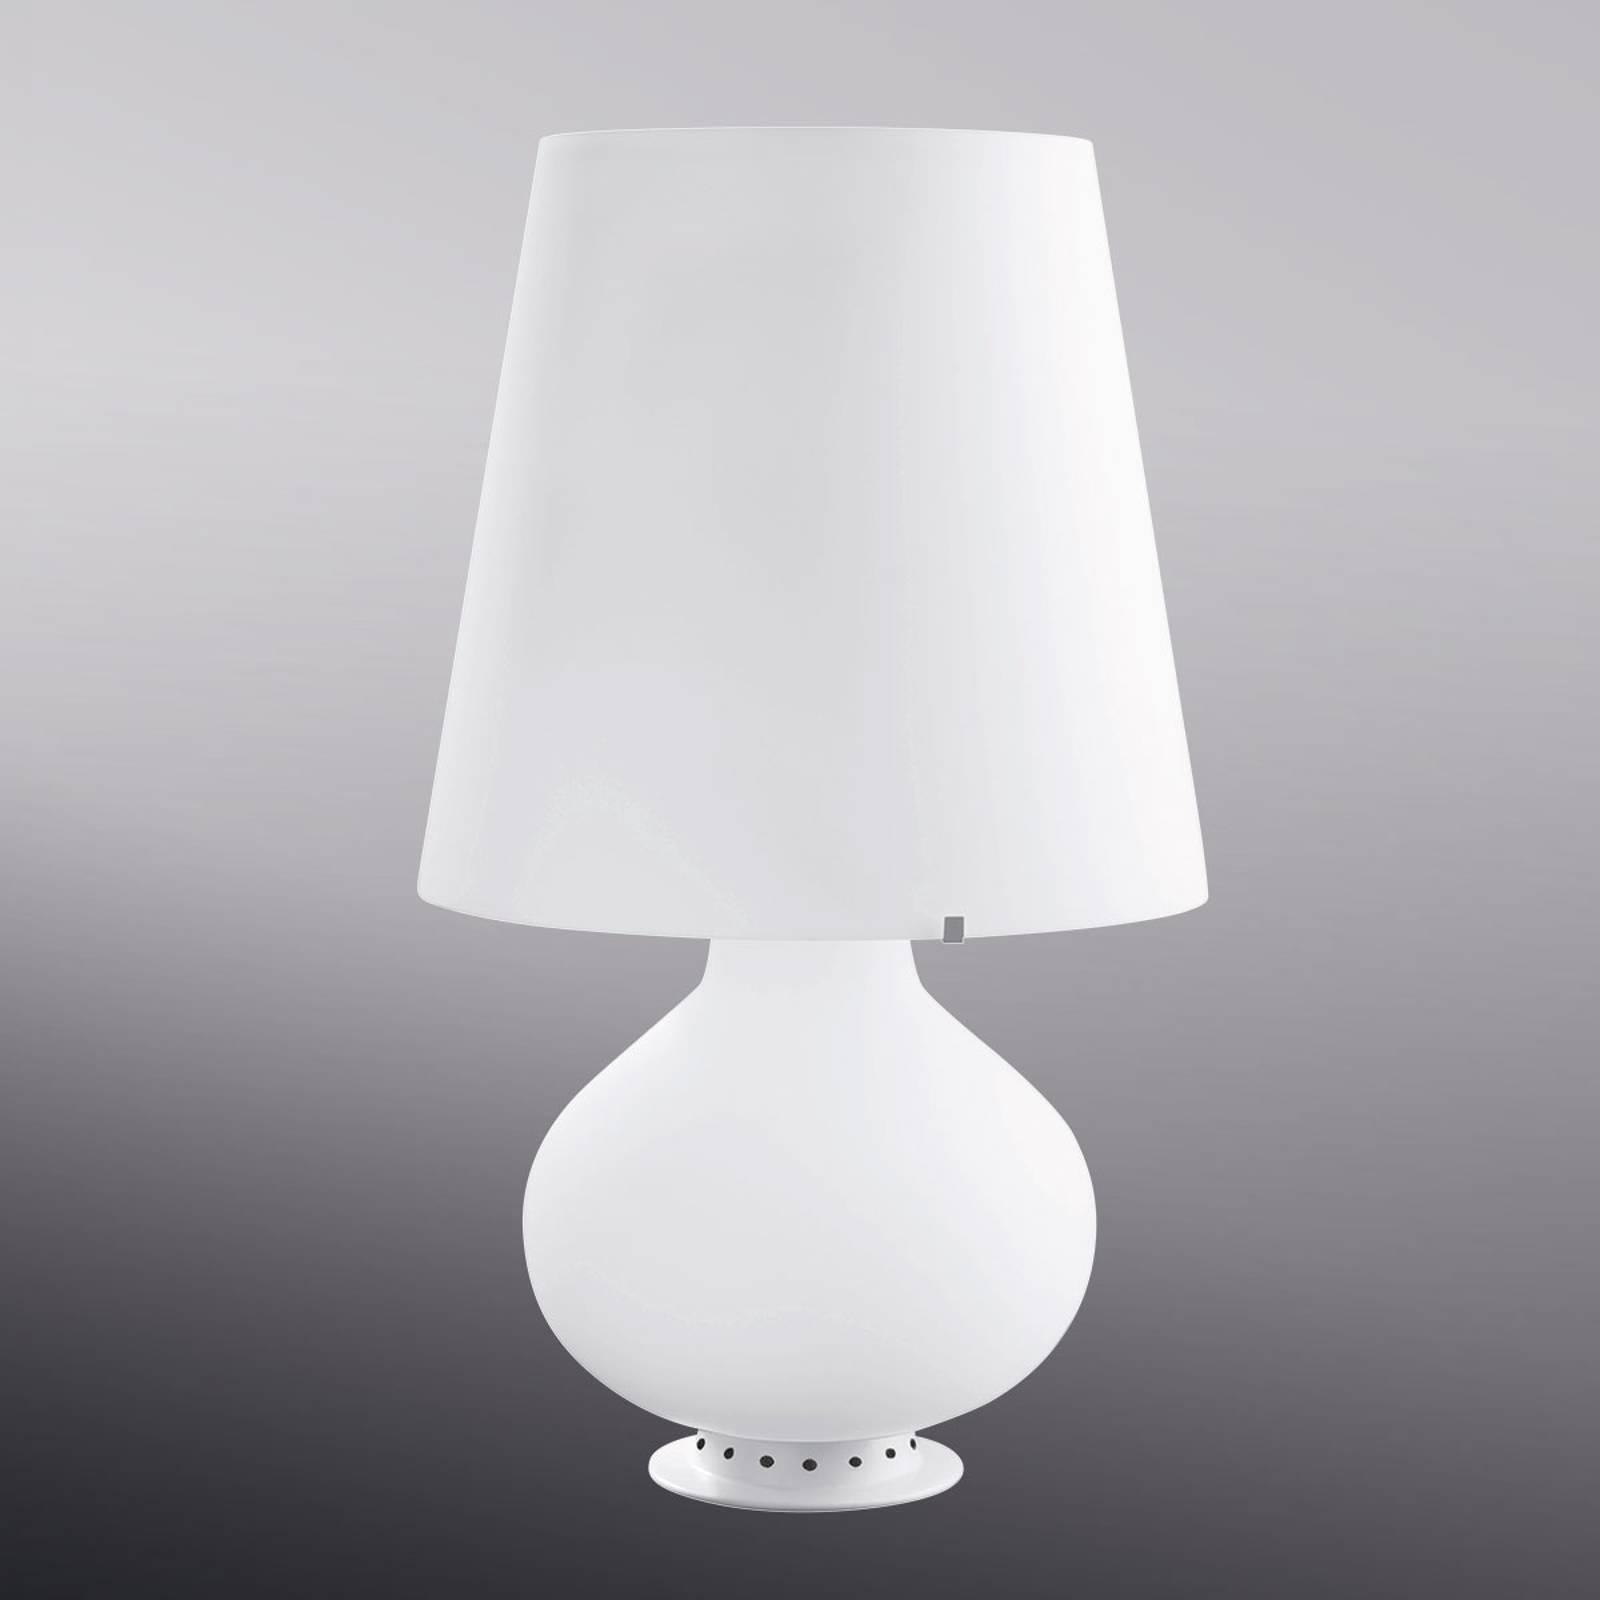 Design-tafellamp FONTANA, 78 cm